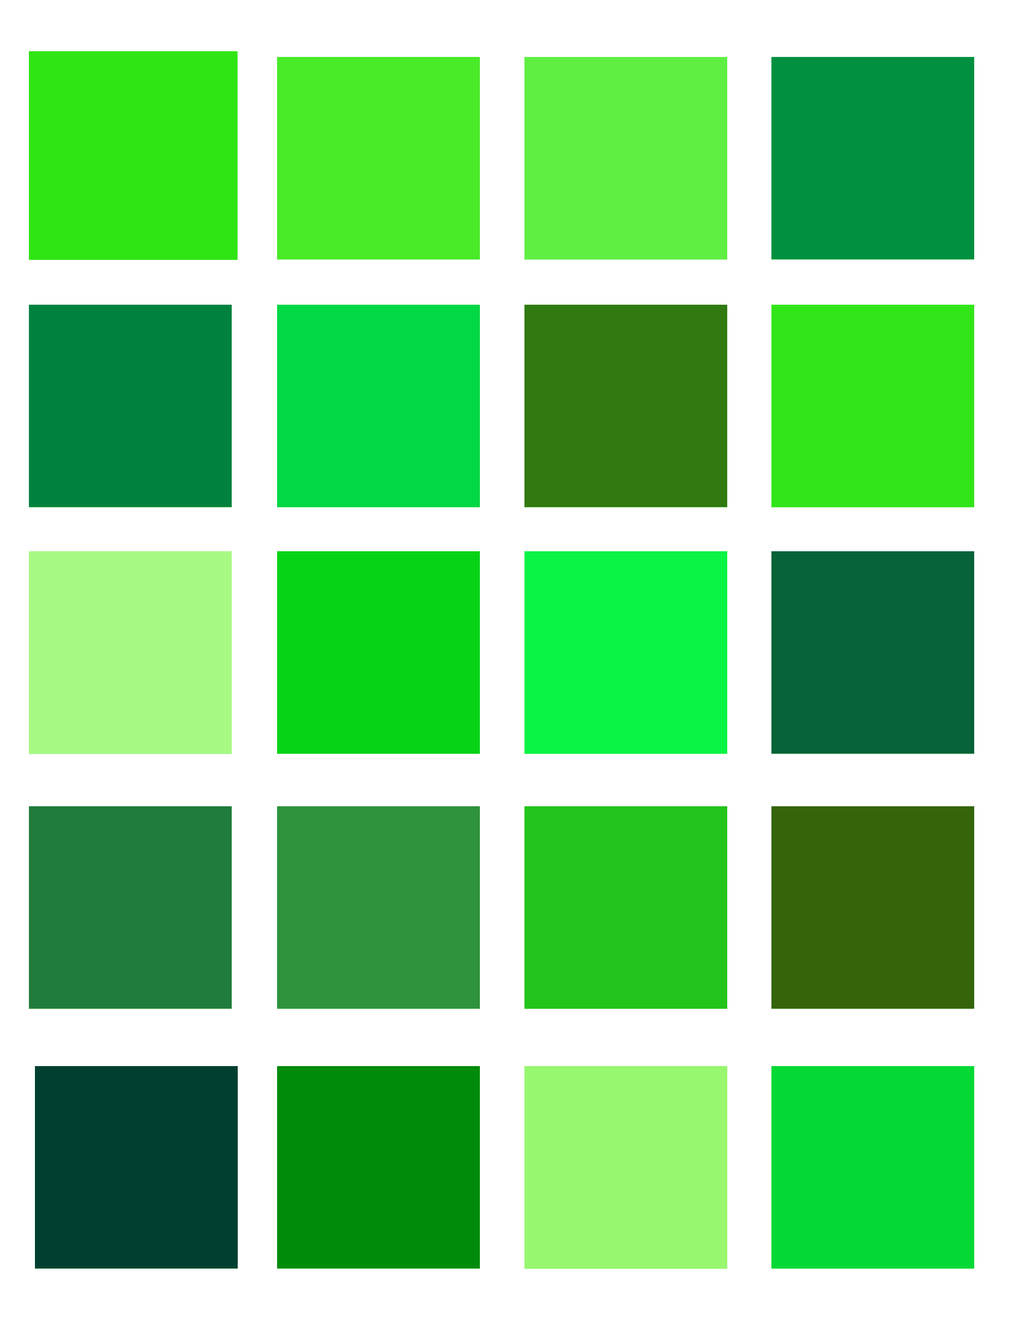 Amtrak paint schemes  Wikipedia